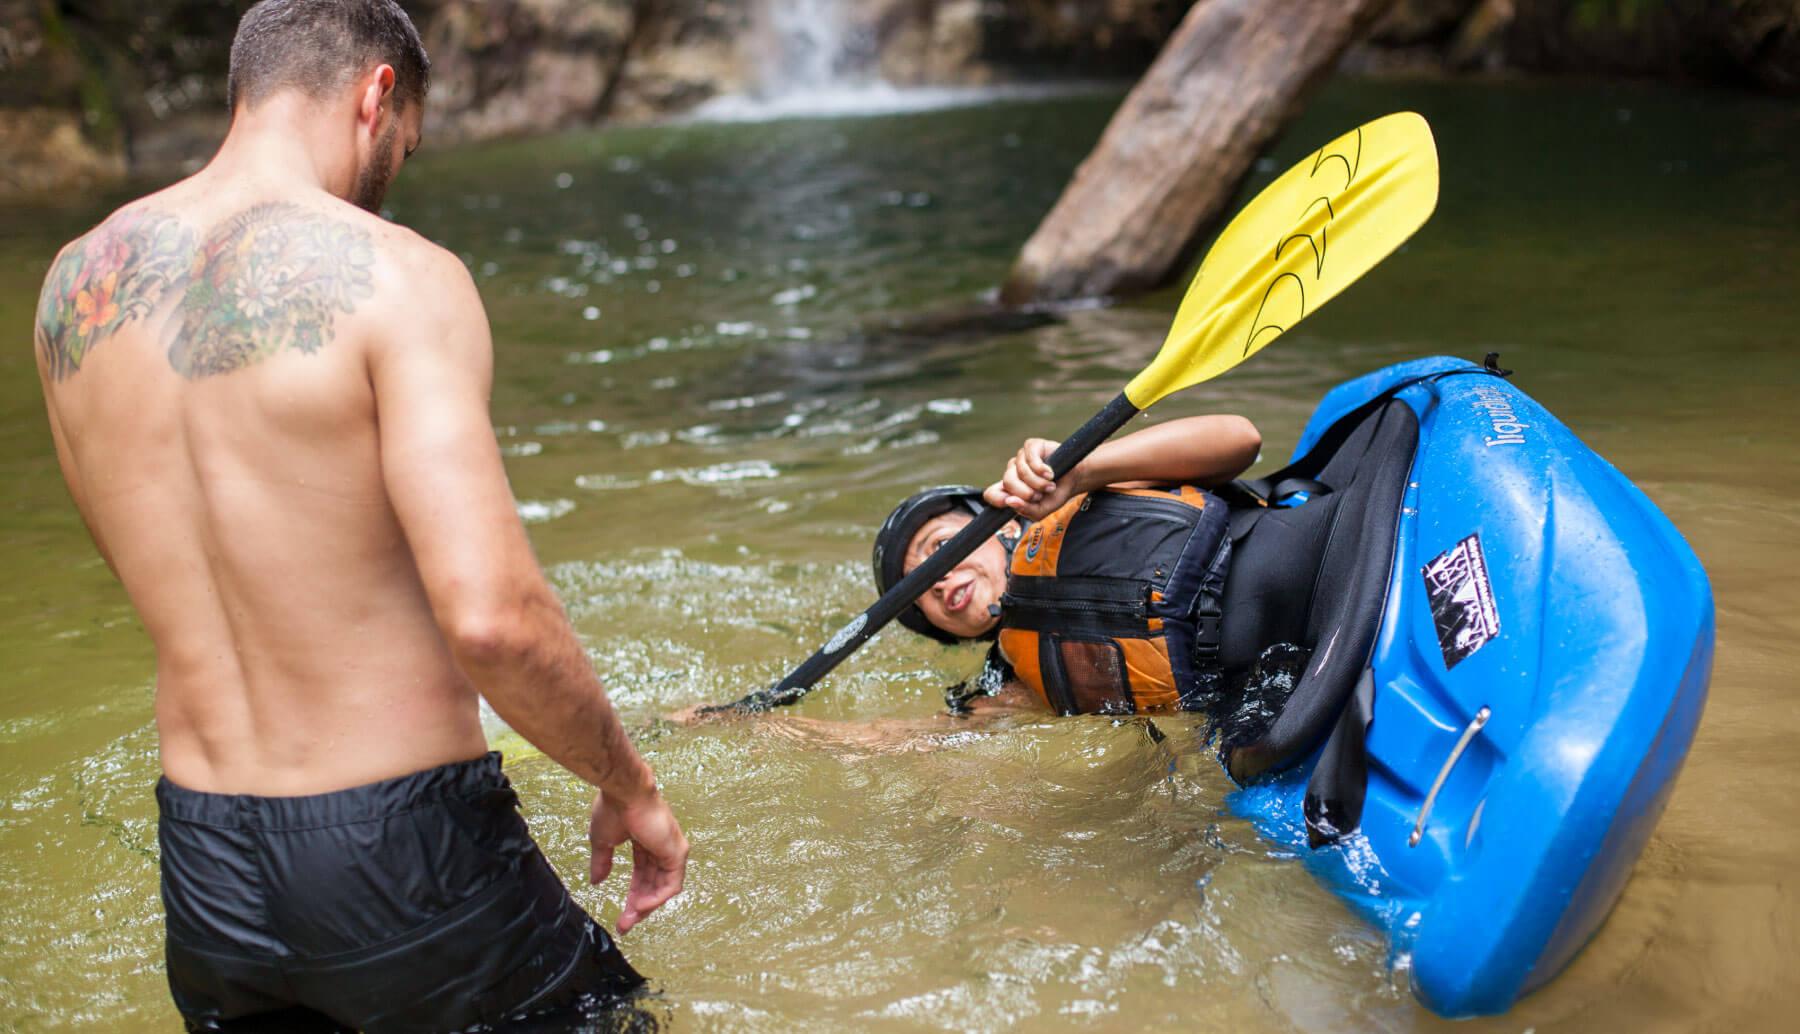 Kayak school lesson with Santiago Canala in Ecuador